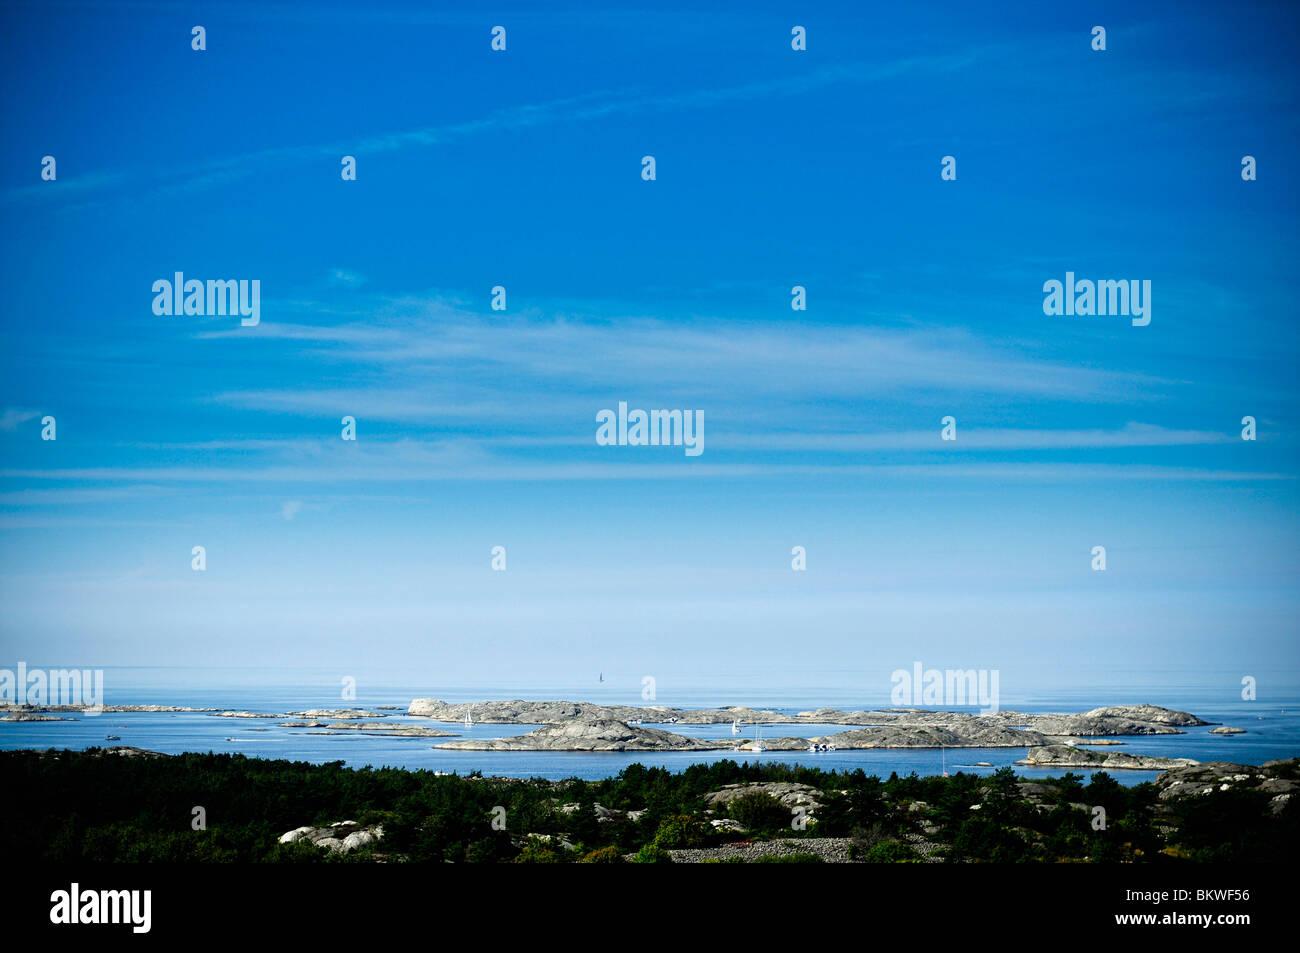 View over archipelago - Stock Image